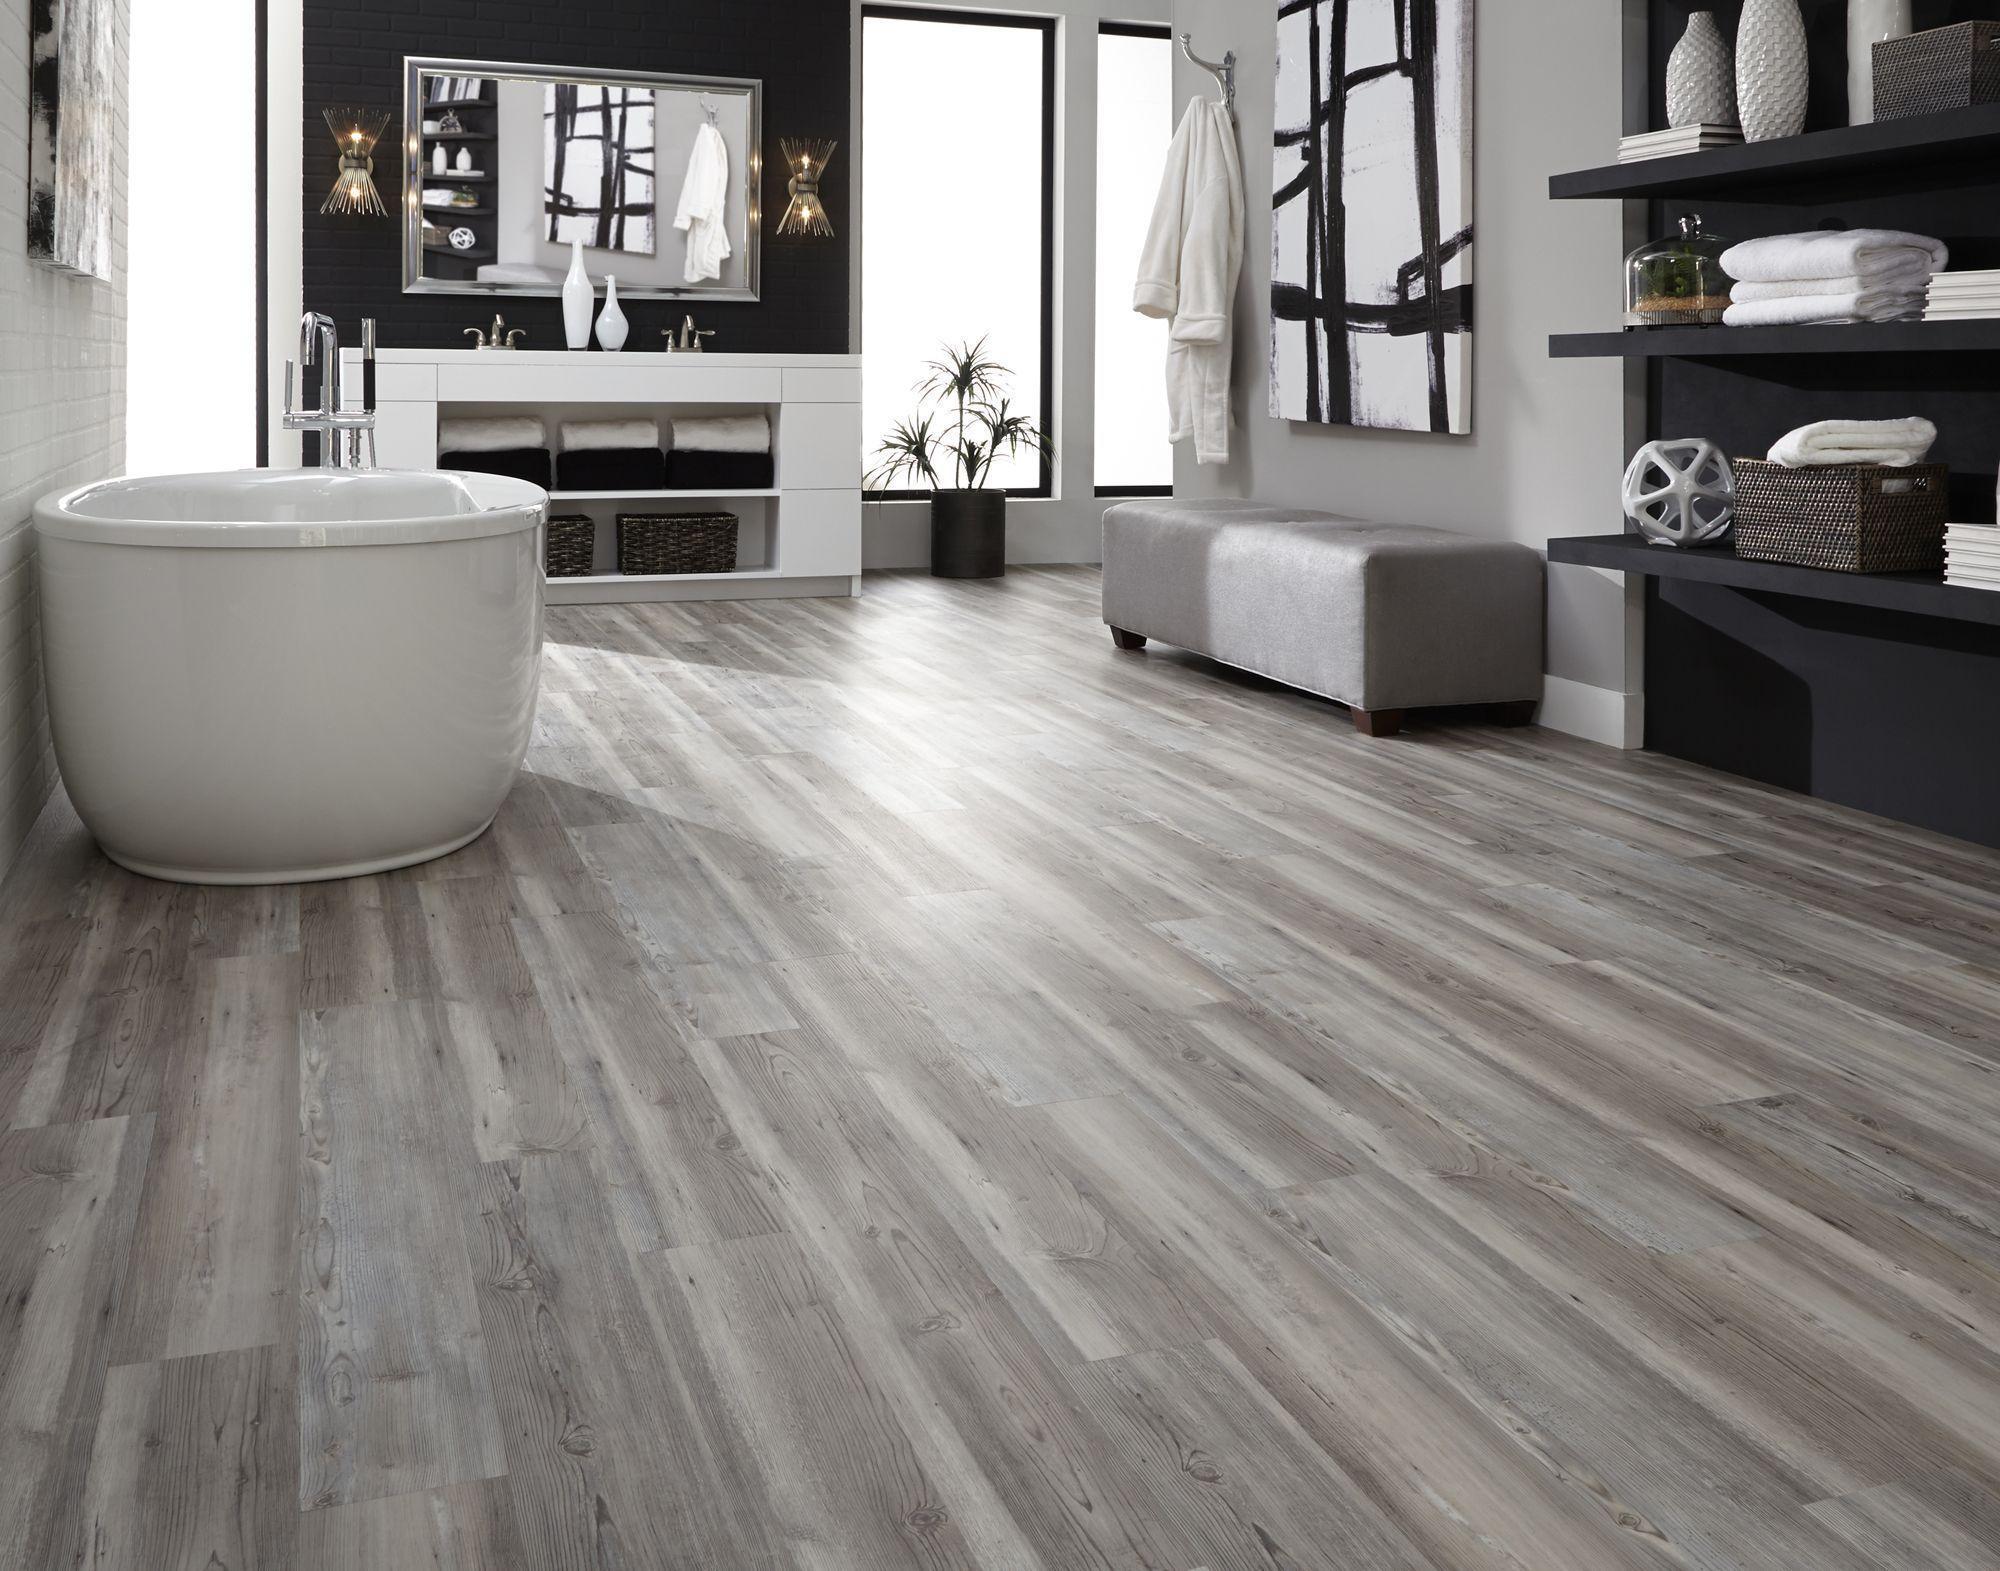 floor pergo catkin laminate for dwelling wood flooring rustic ideas white waterproof org